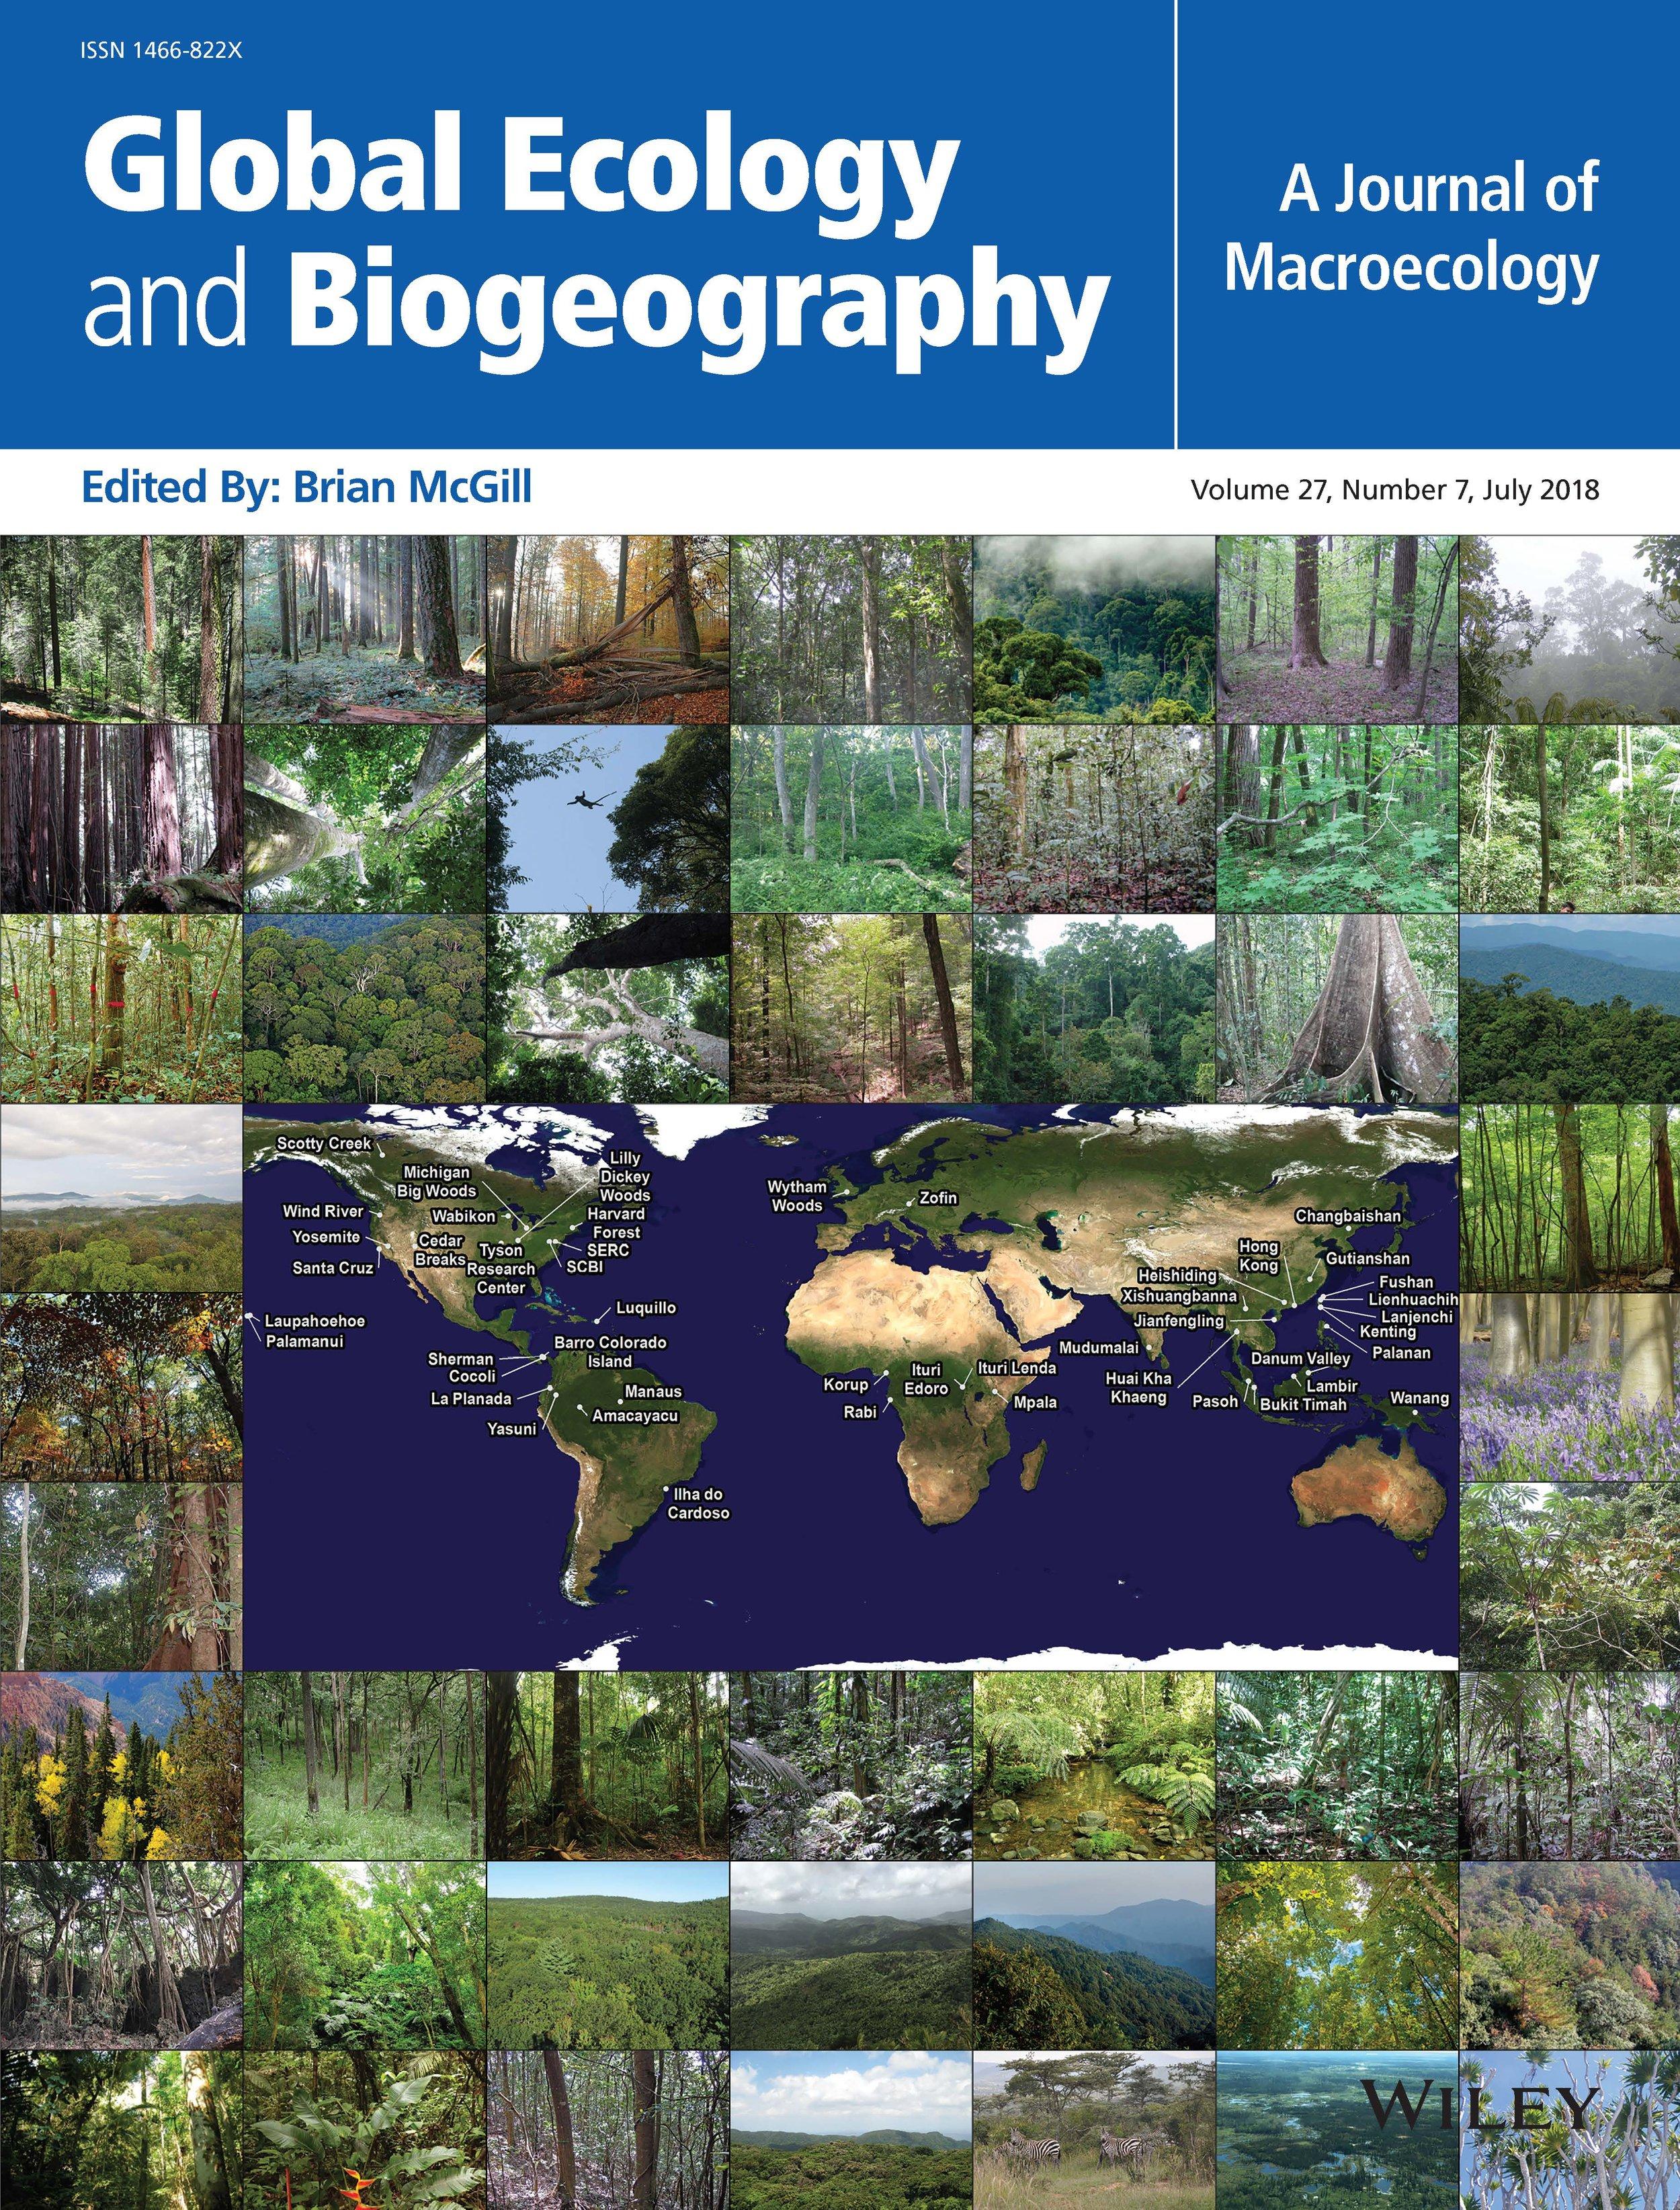 Lutz_et_al-2018-Global_Ecology_and_Biogeography.jpg